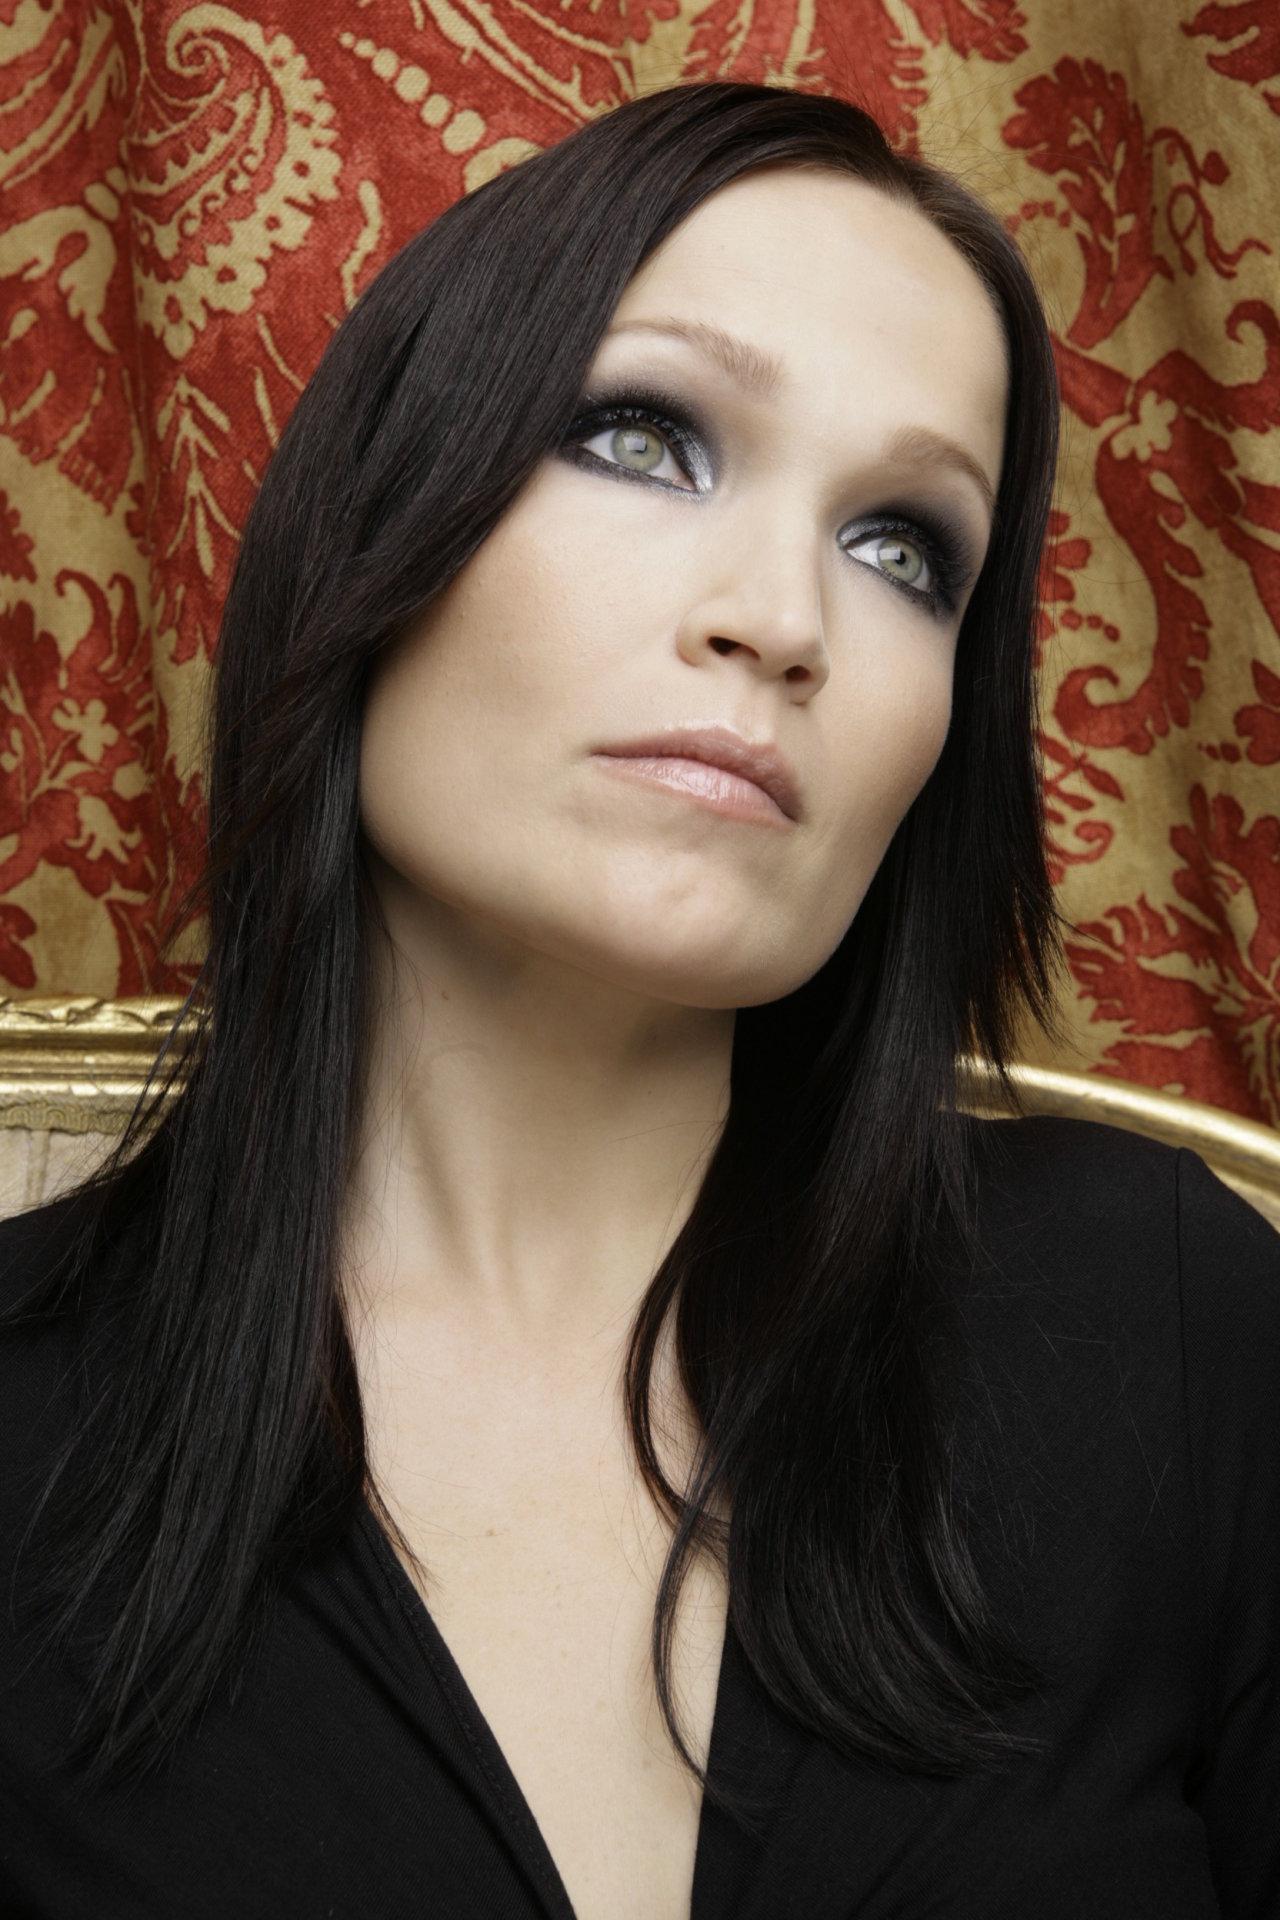 Celebrity Tarja Turunen Photos. Pictures, wallpapers ... Thora Birch